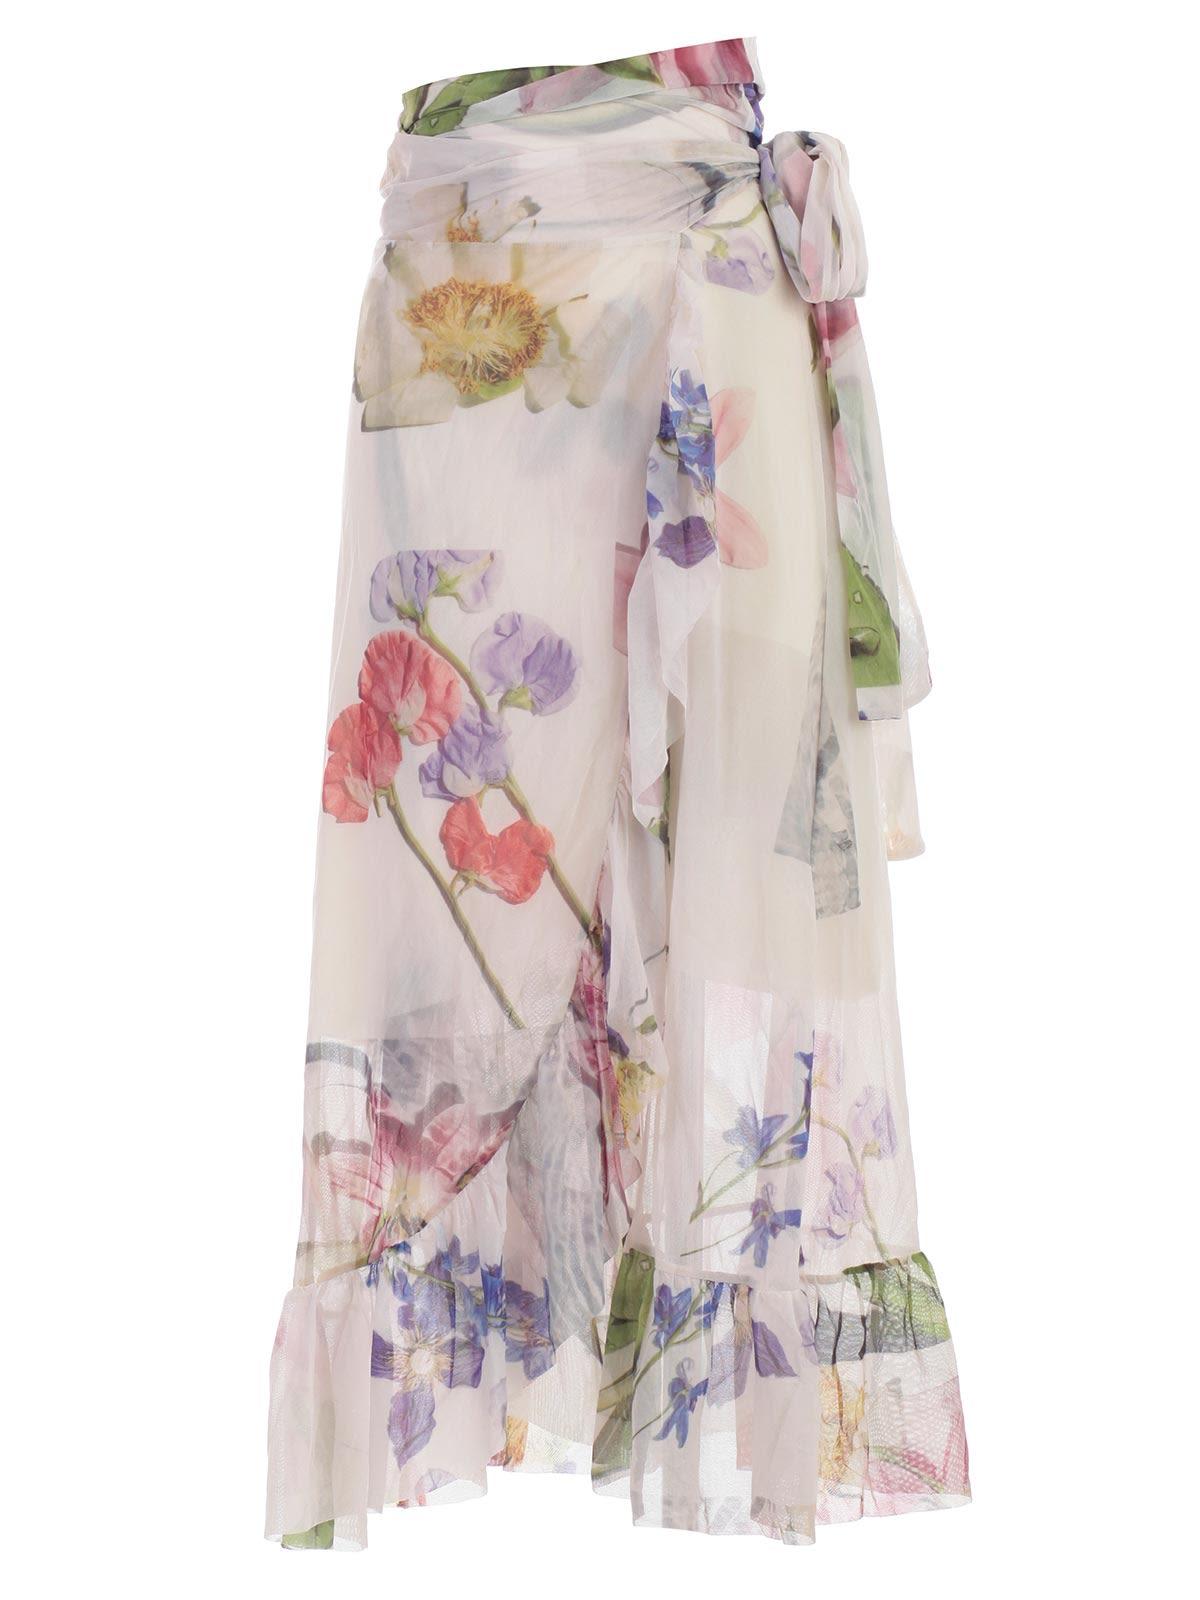 7aa186fe24 Ganni Ganni Floral Wrap Skirt - Bright White - 10904791